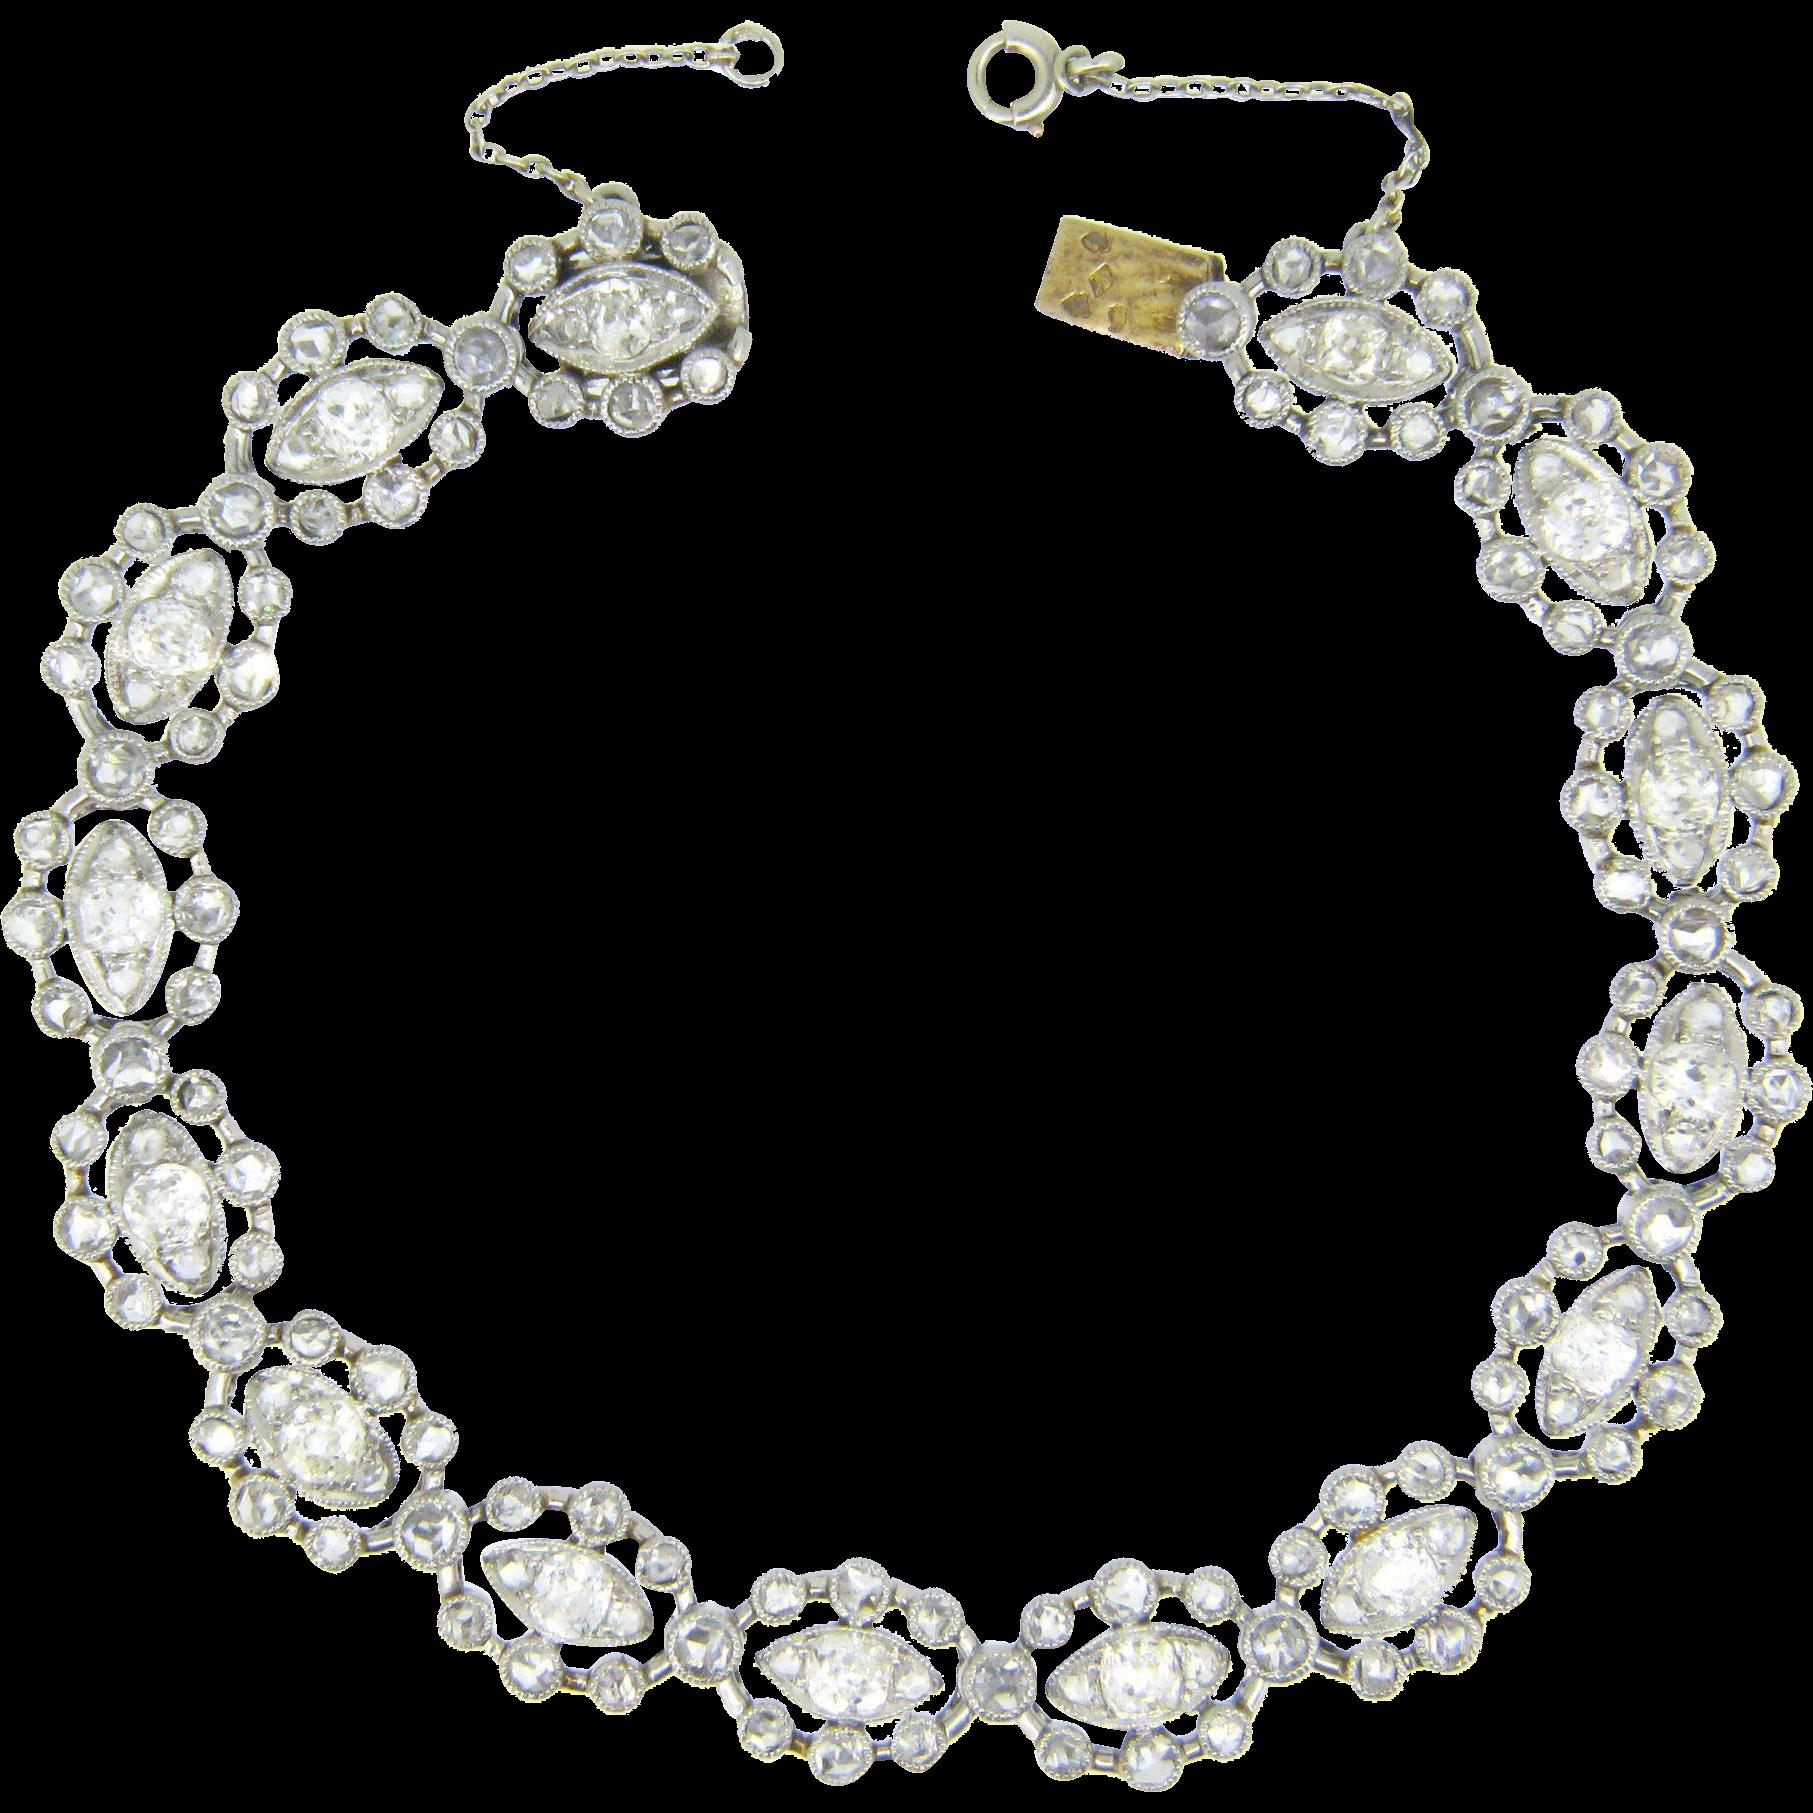 French Belle Epoque Diamonds Bracelet, 18kt gold and platinum, .c1910